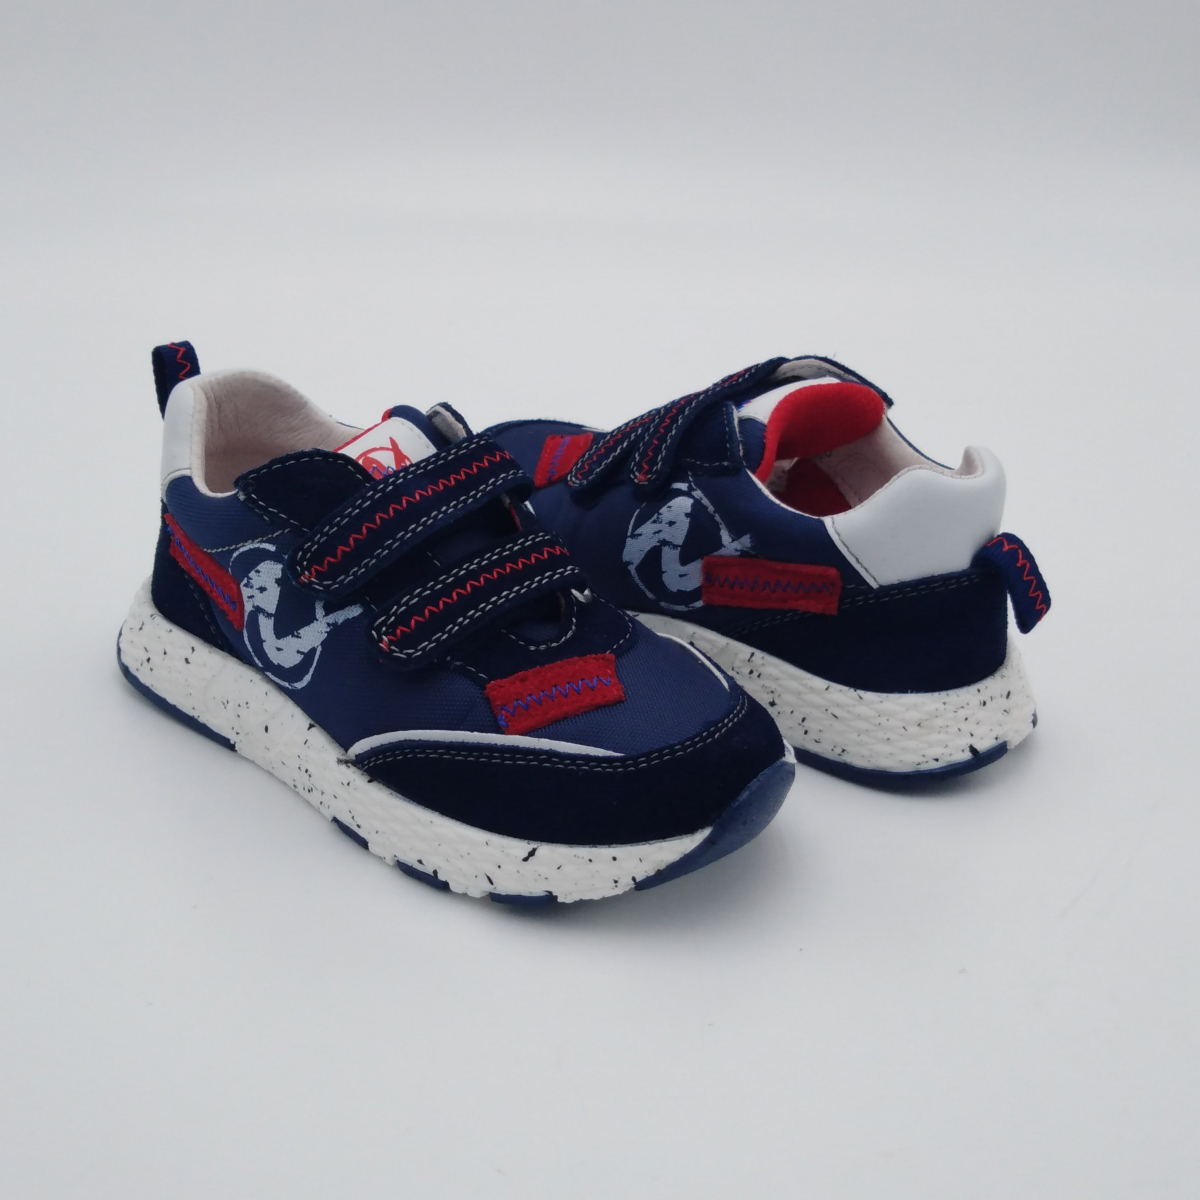 Naturino Delt vl - Sneaker...